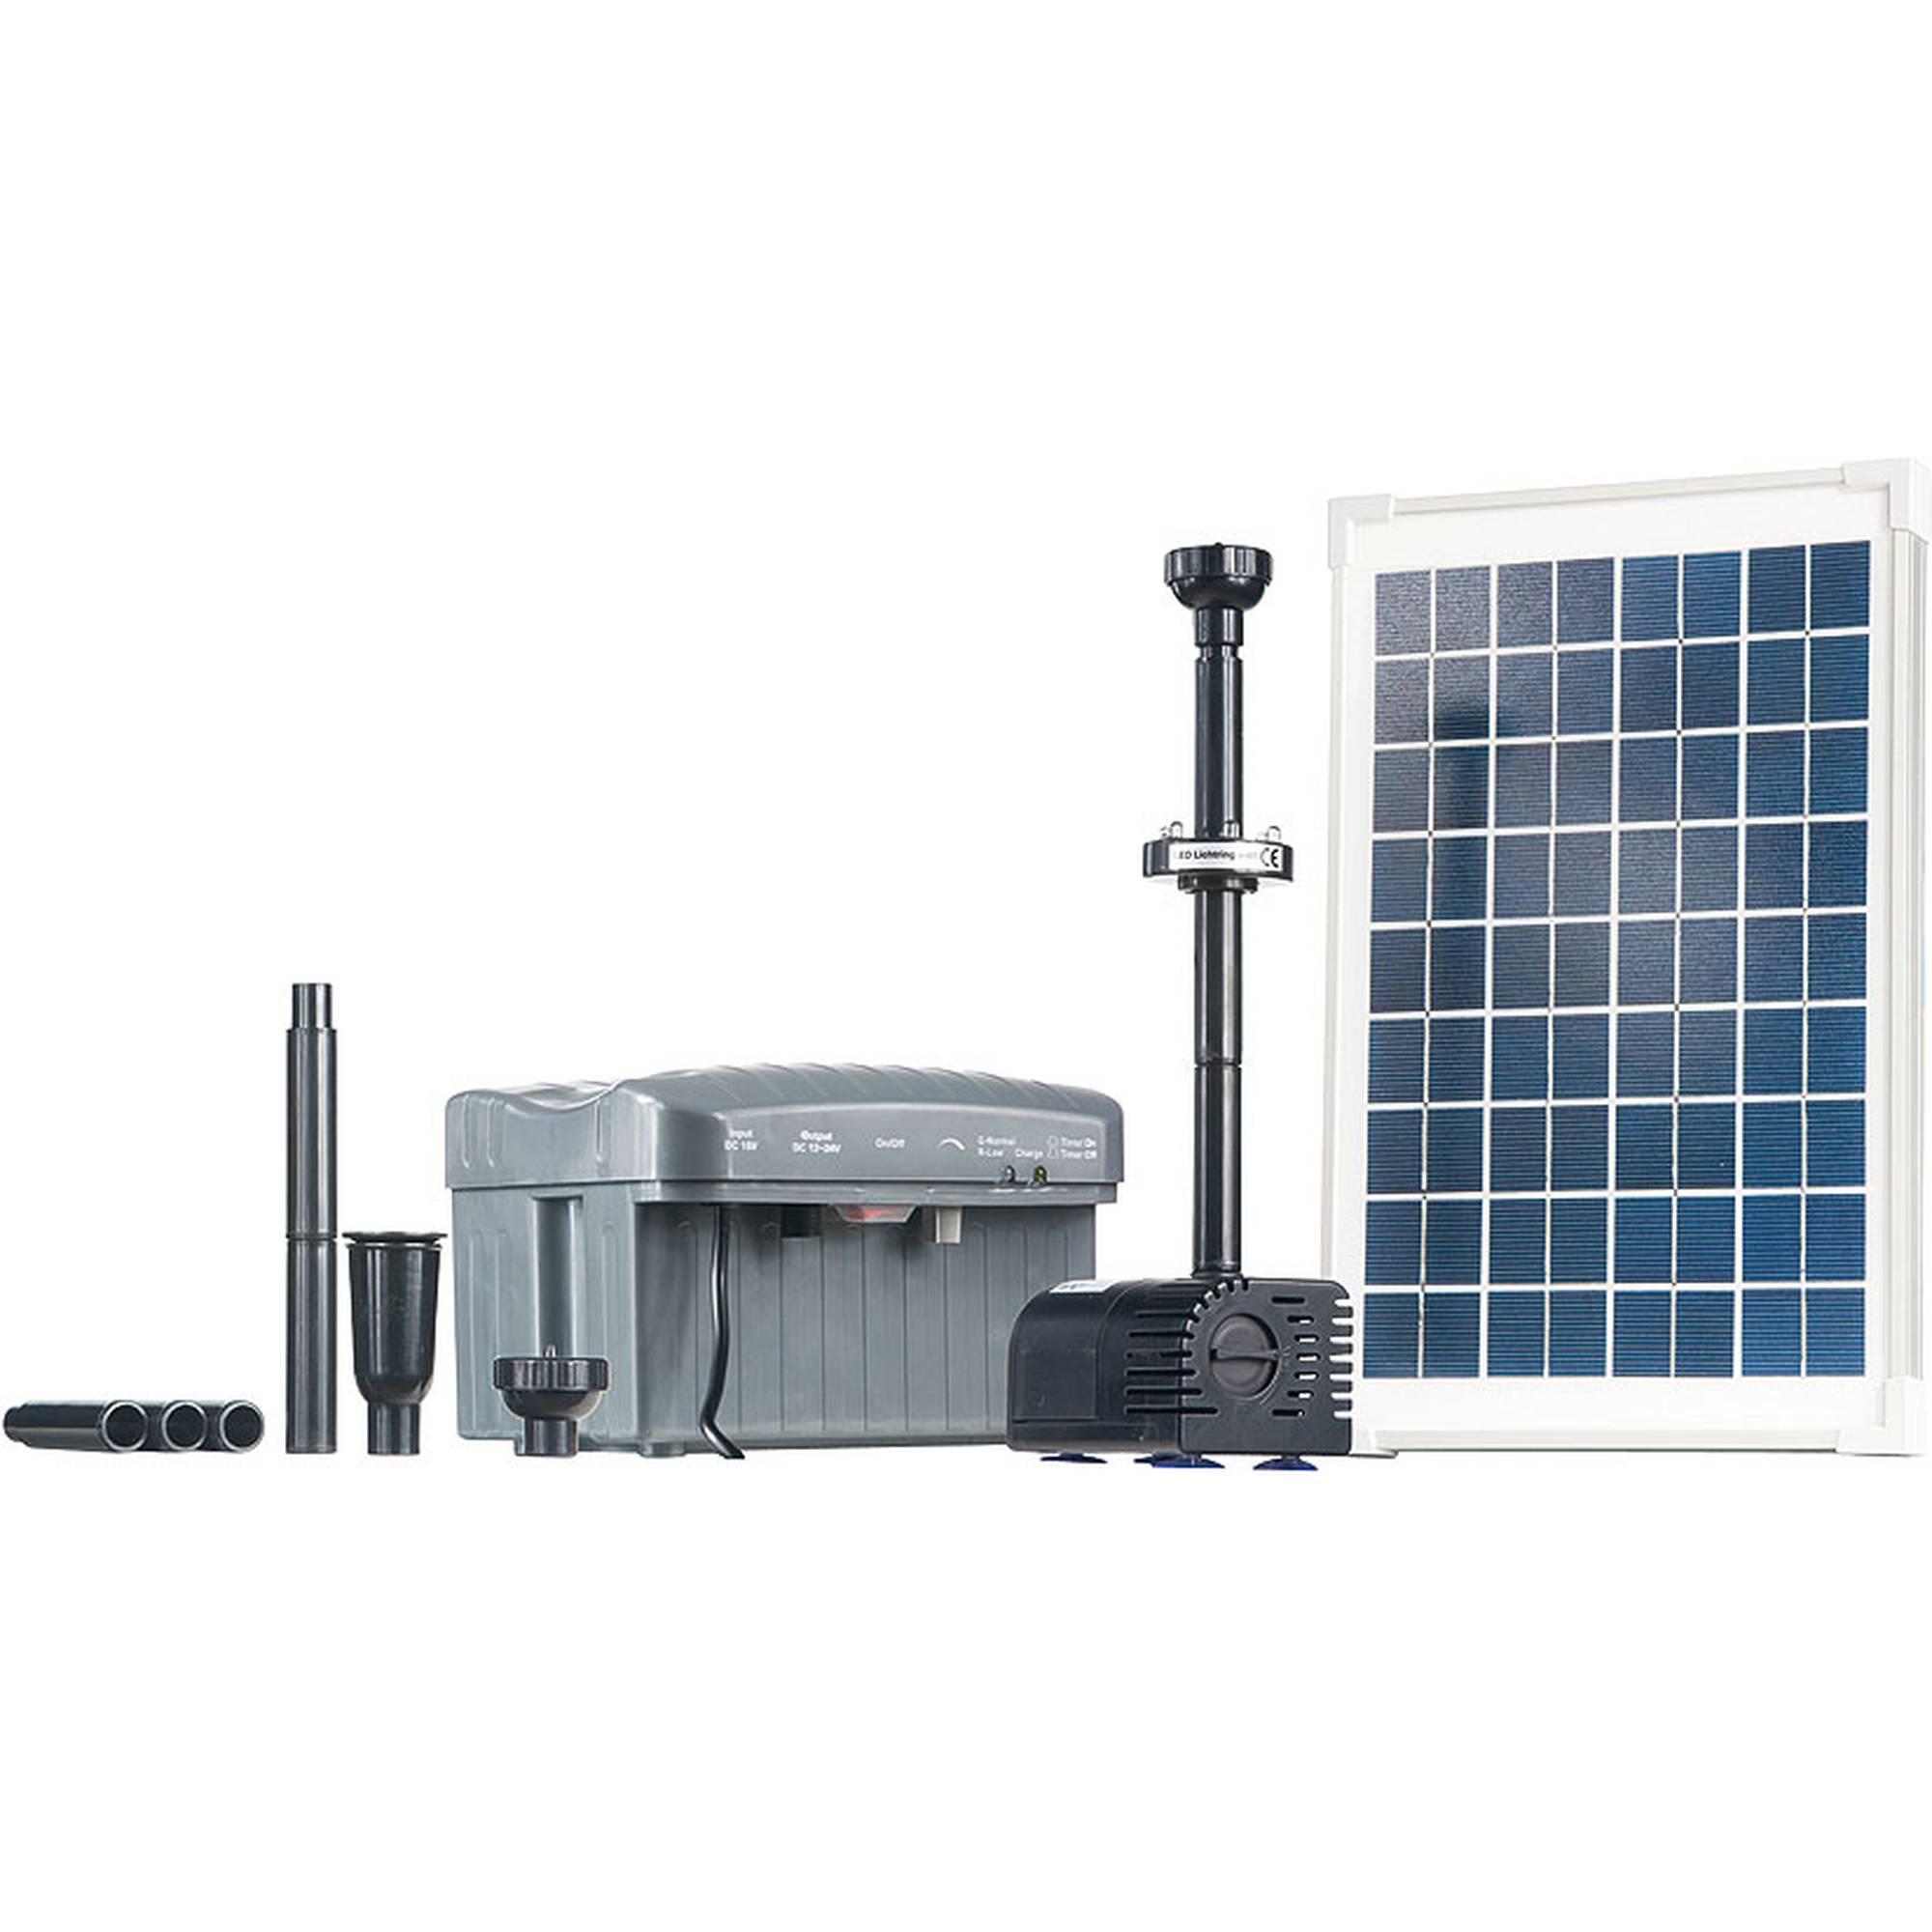 Solar-Teichpumpen-Set 750 l/h mit LED